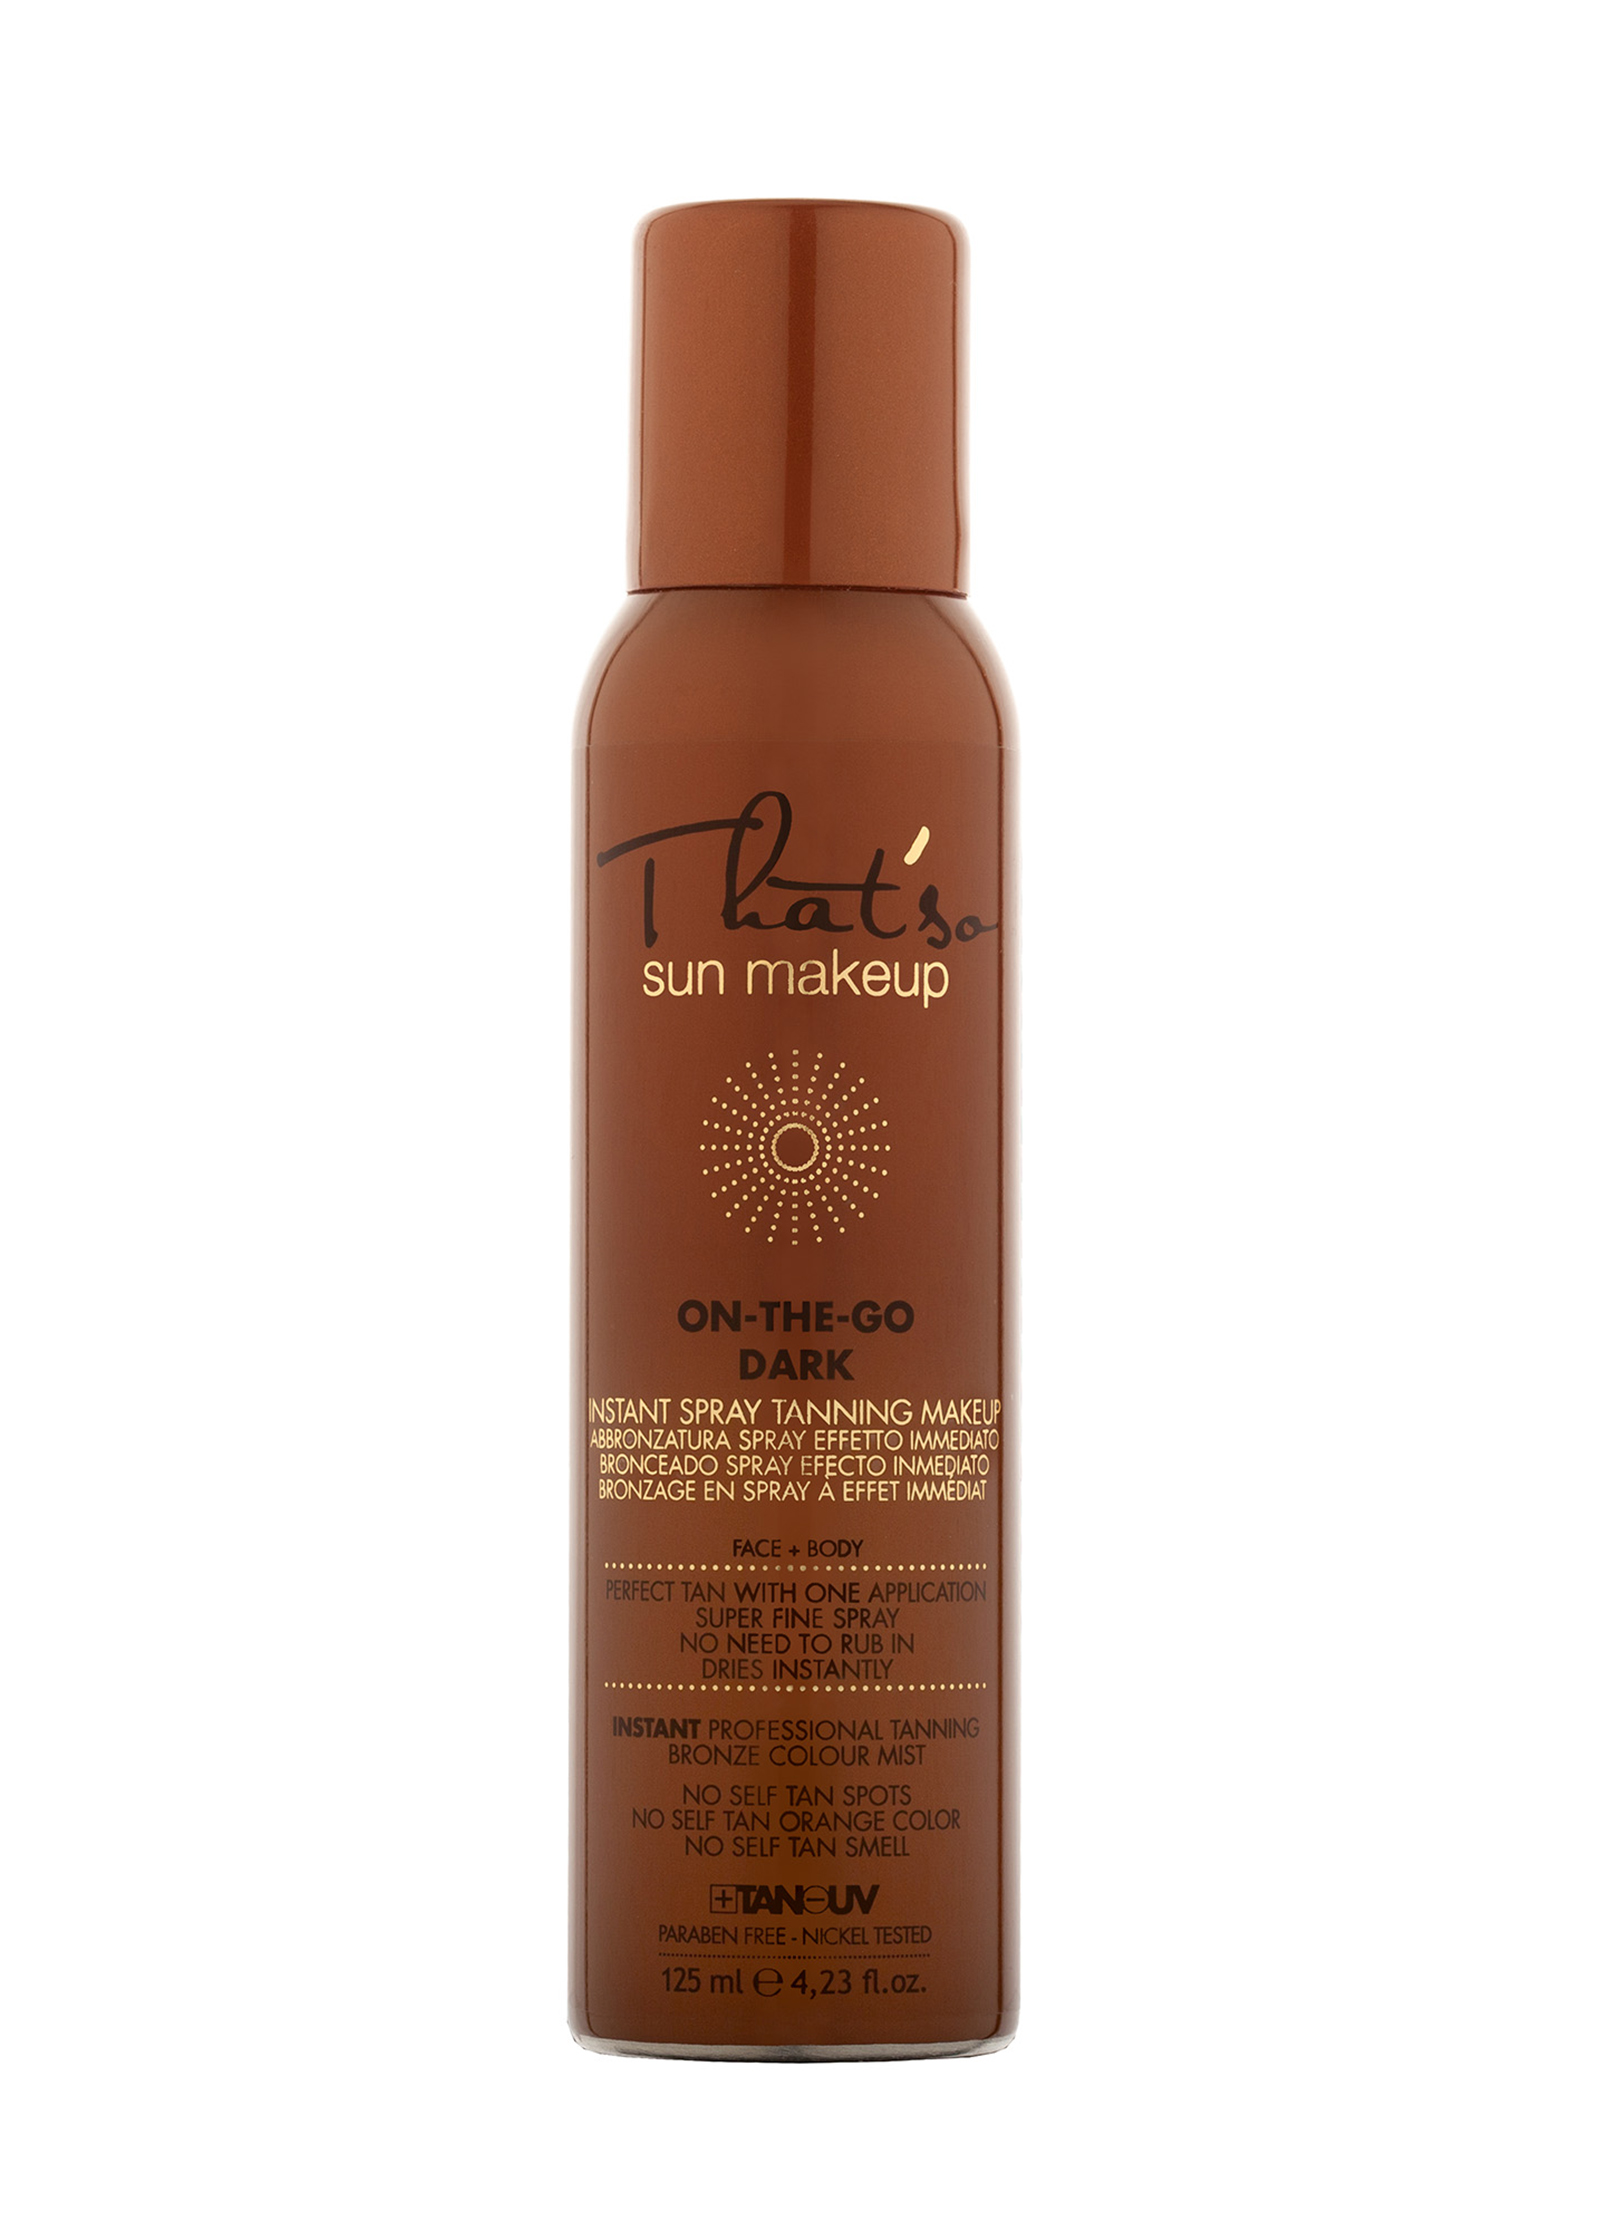 THAT`SO SUN MAKEUP On-The-Go Dark Spray Tanning Makeup